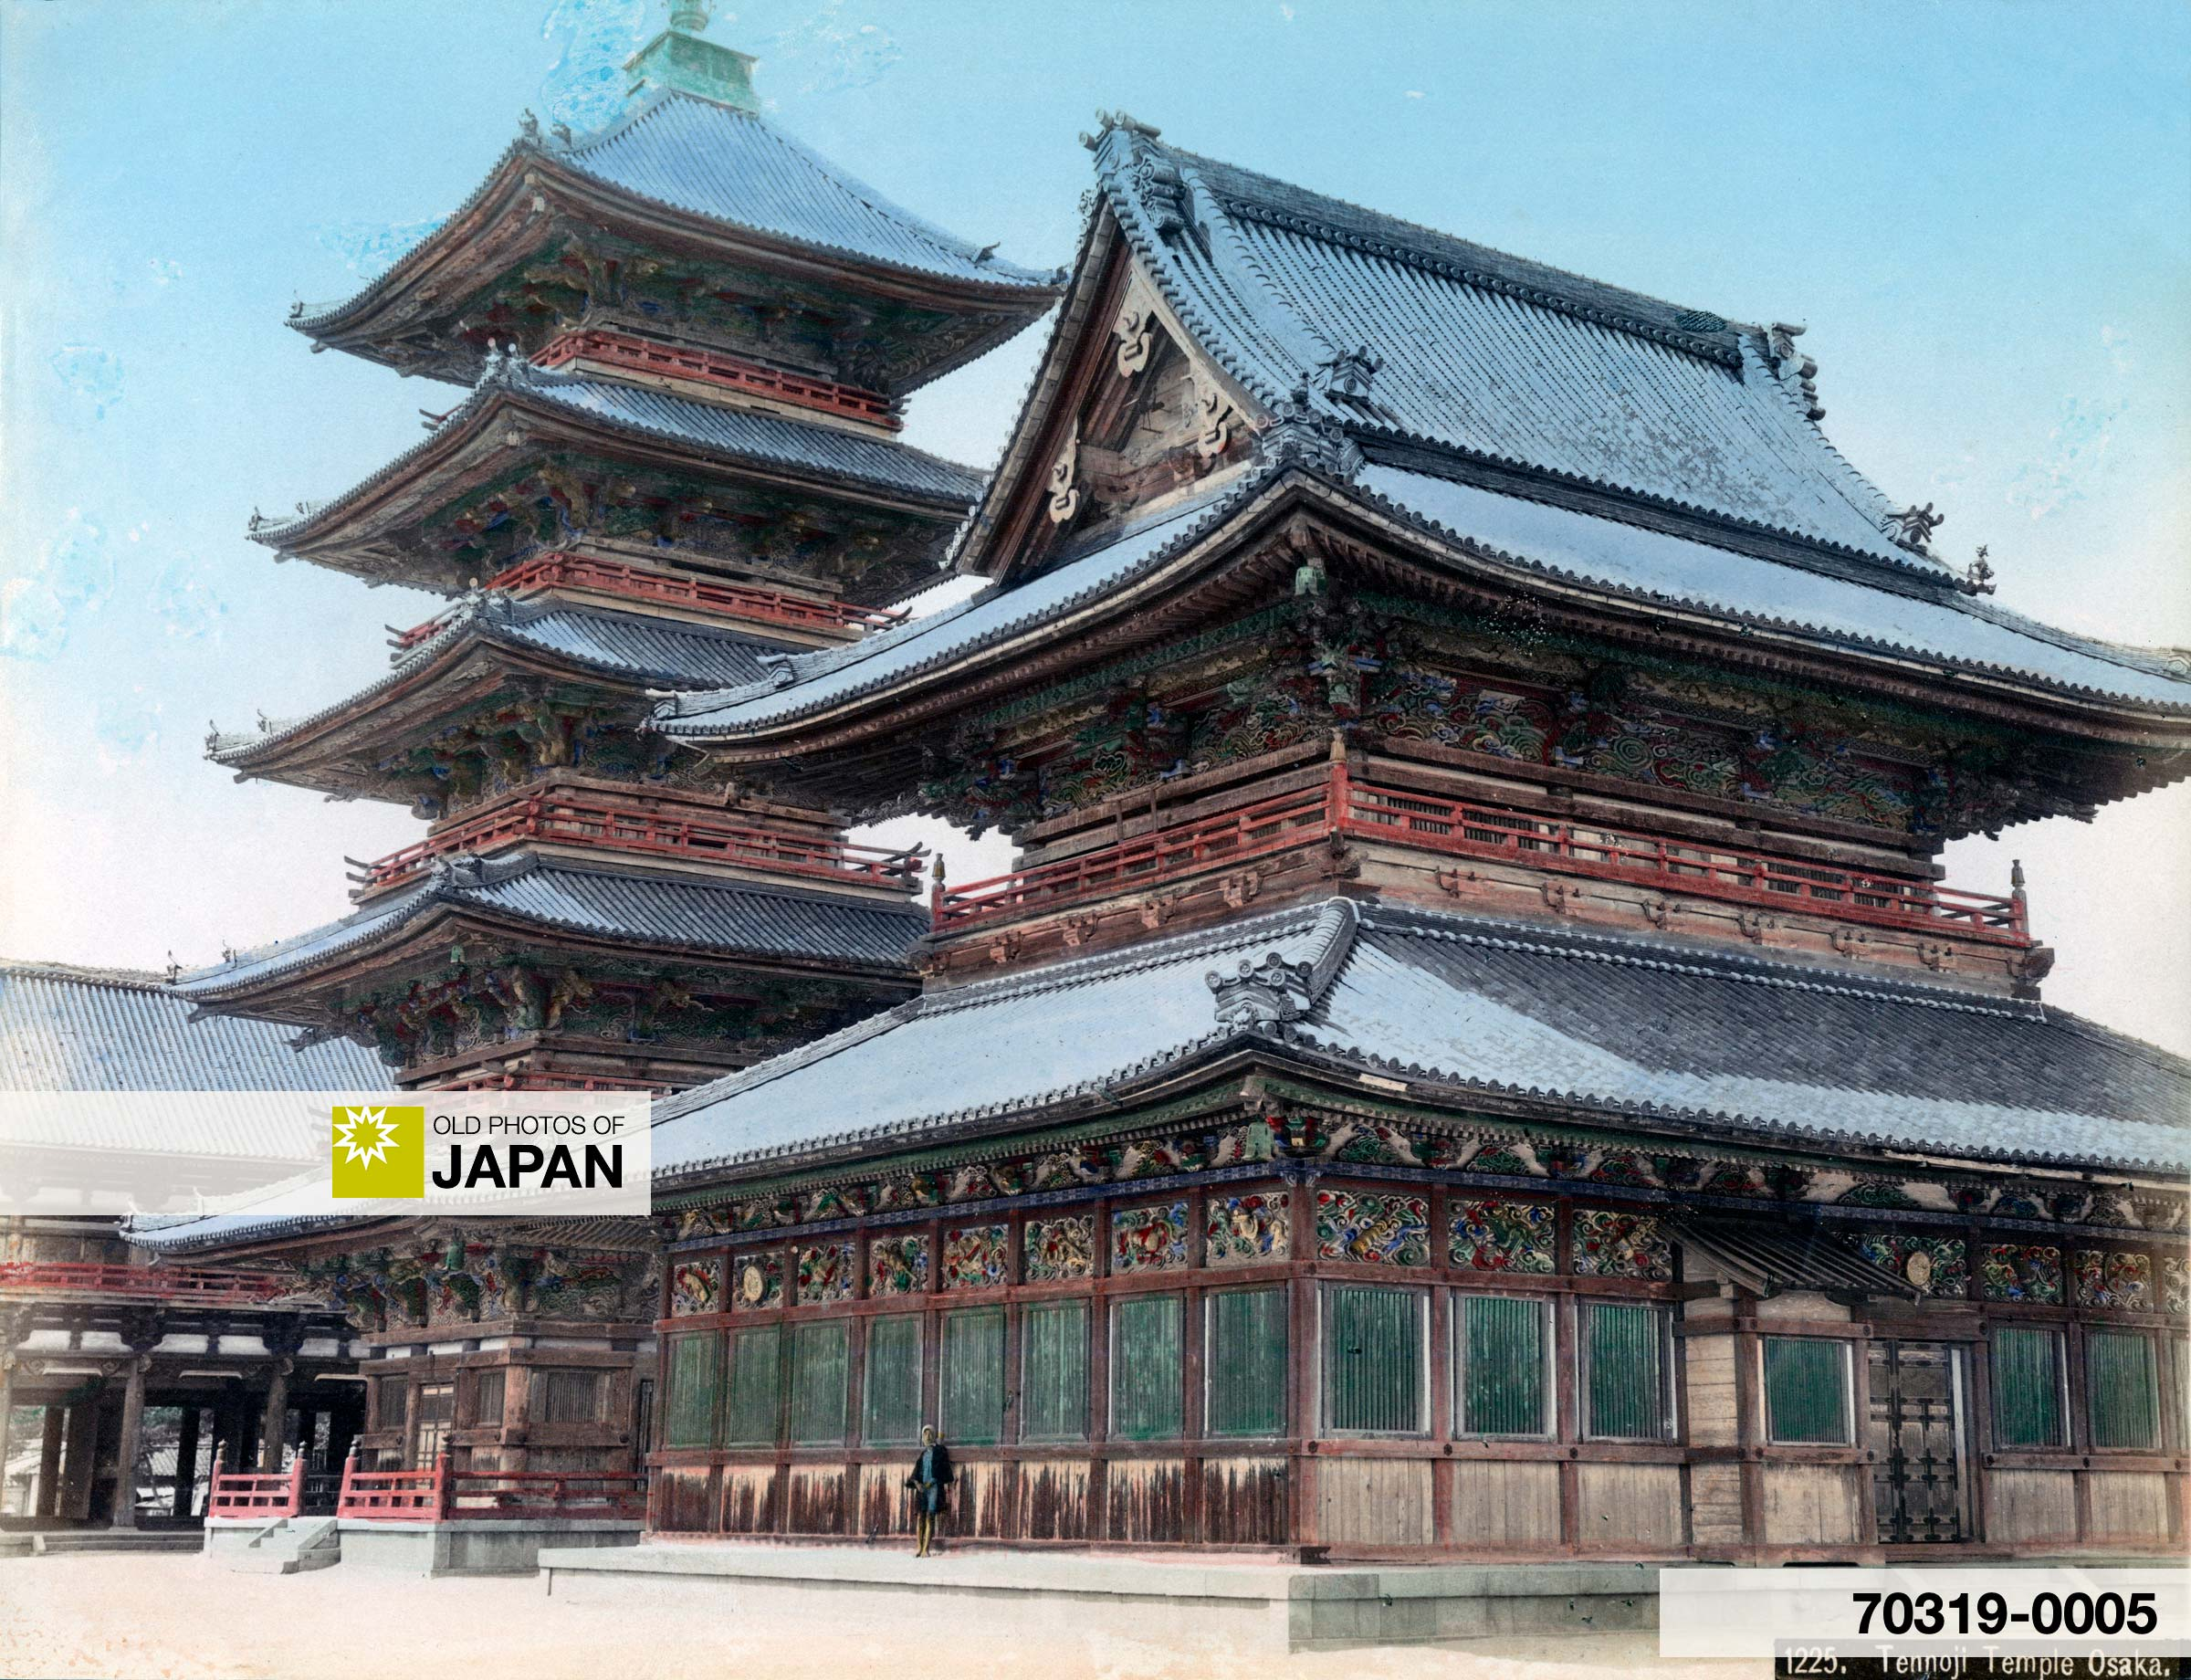 Osaka 1880s: Shitennoji Temple